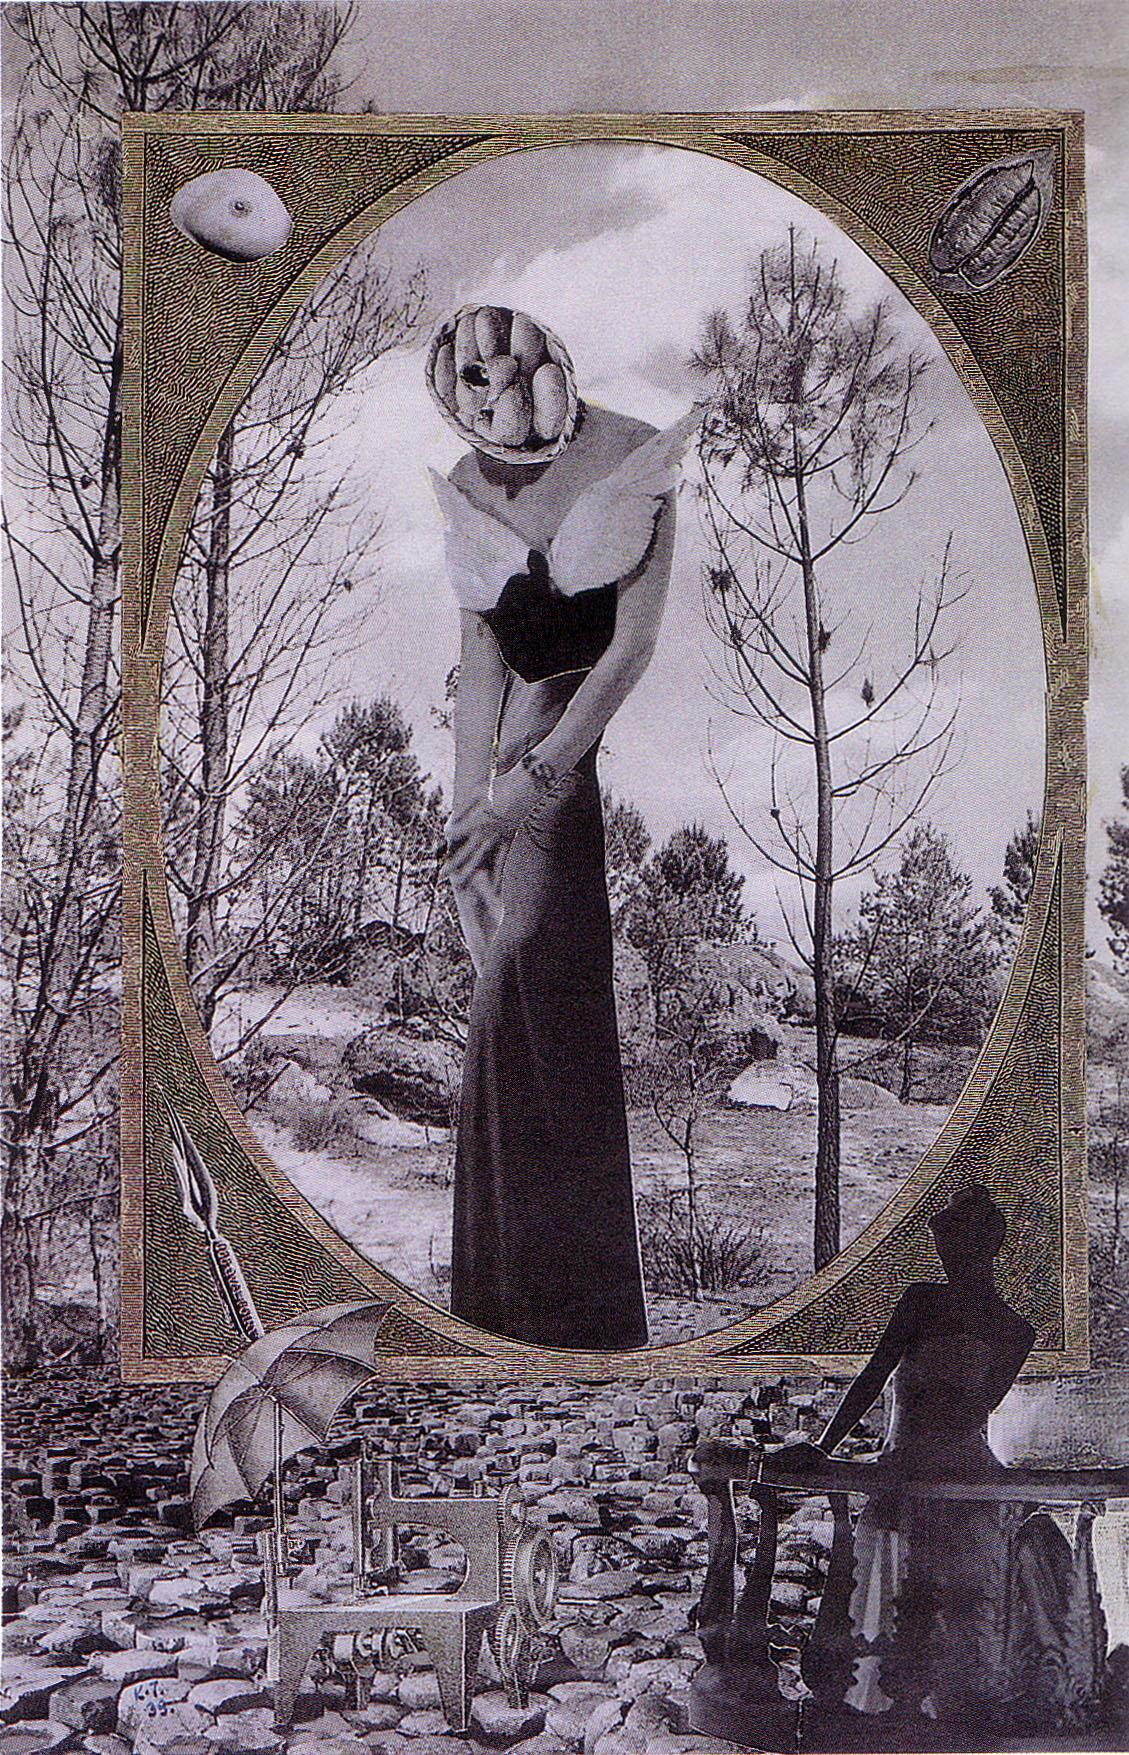 Karel Teige- Collage# 73,1939 (c) Nachlass Karel Teige